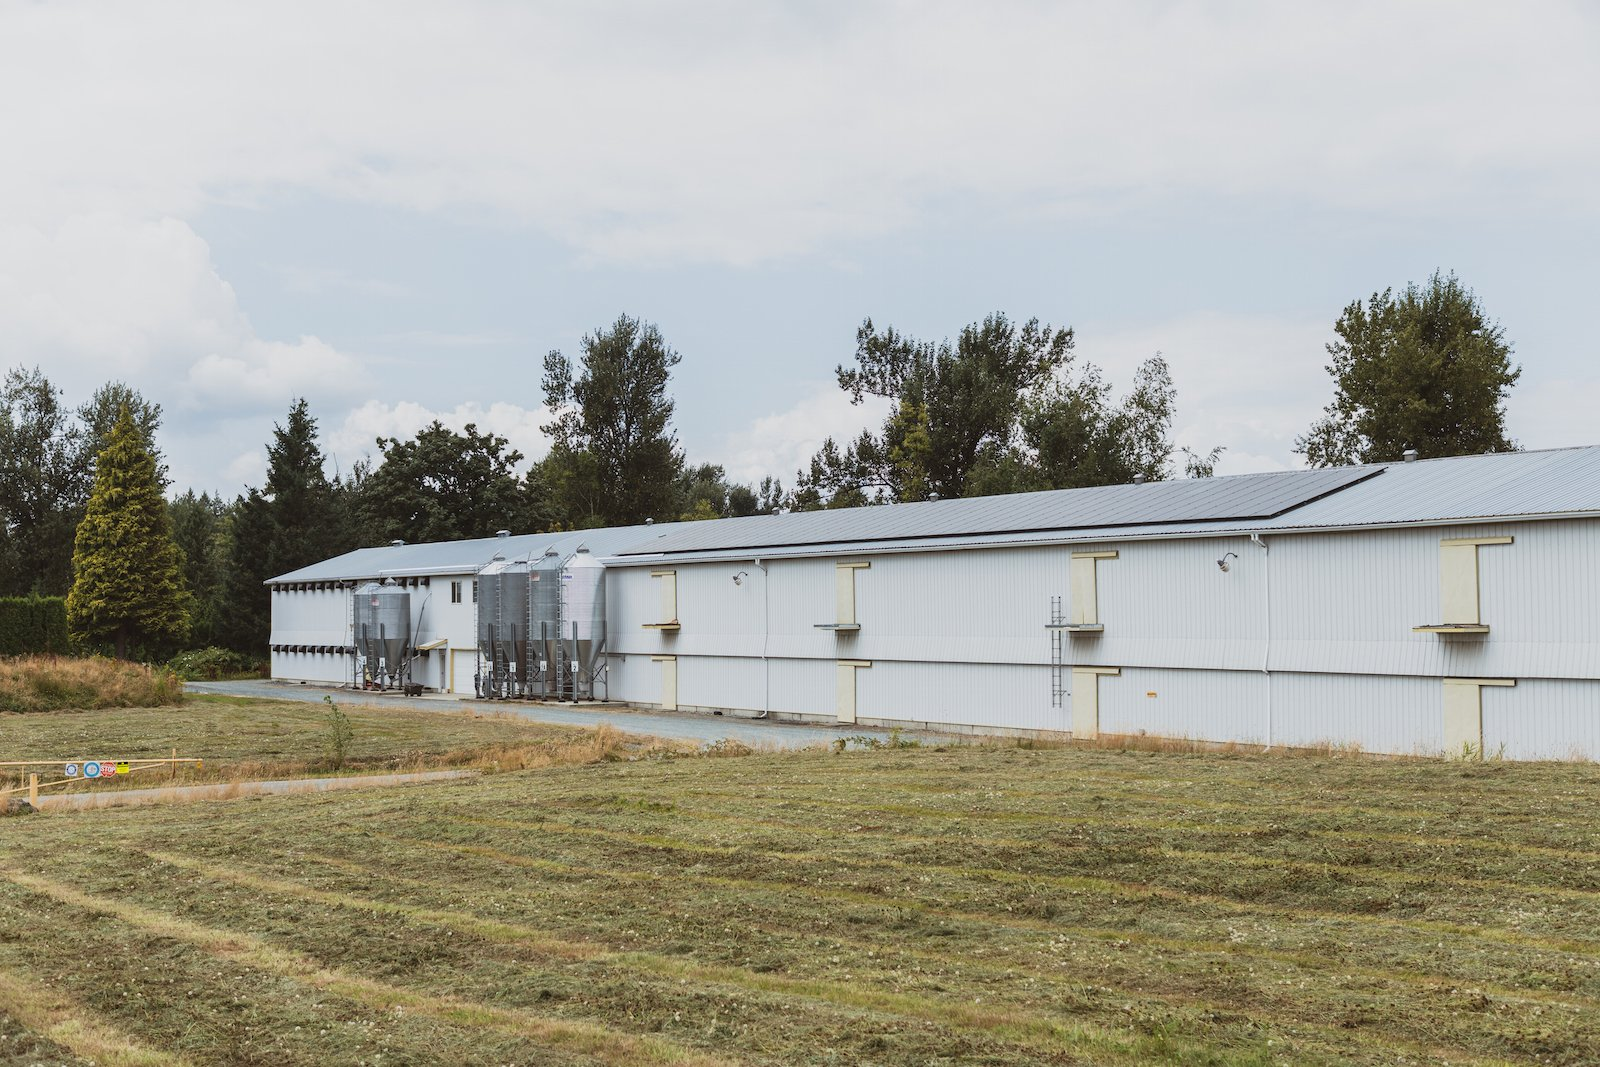 SJ Ritchie Research Farms